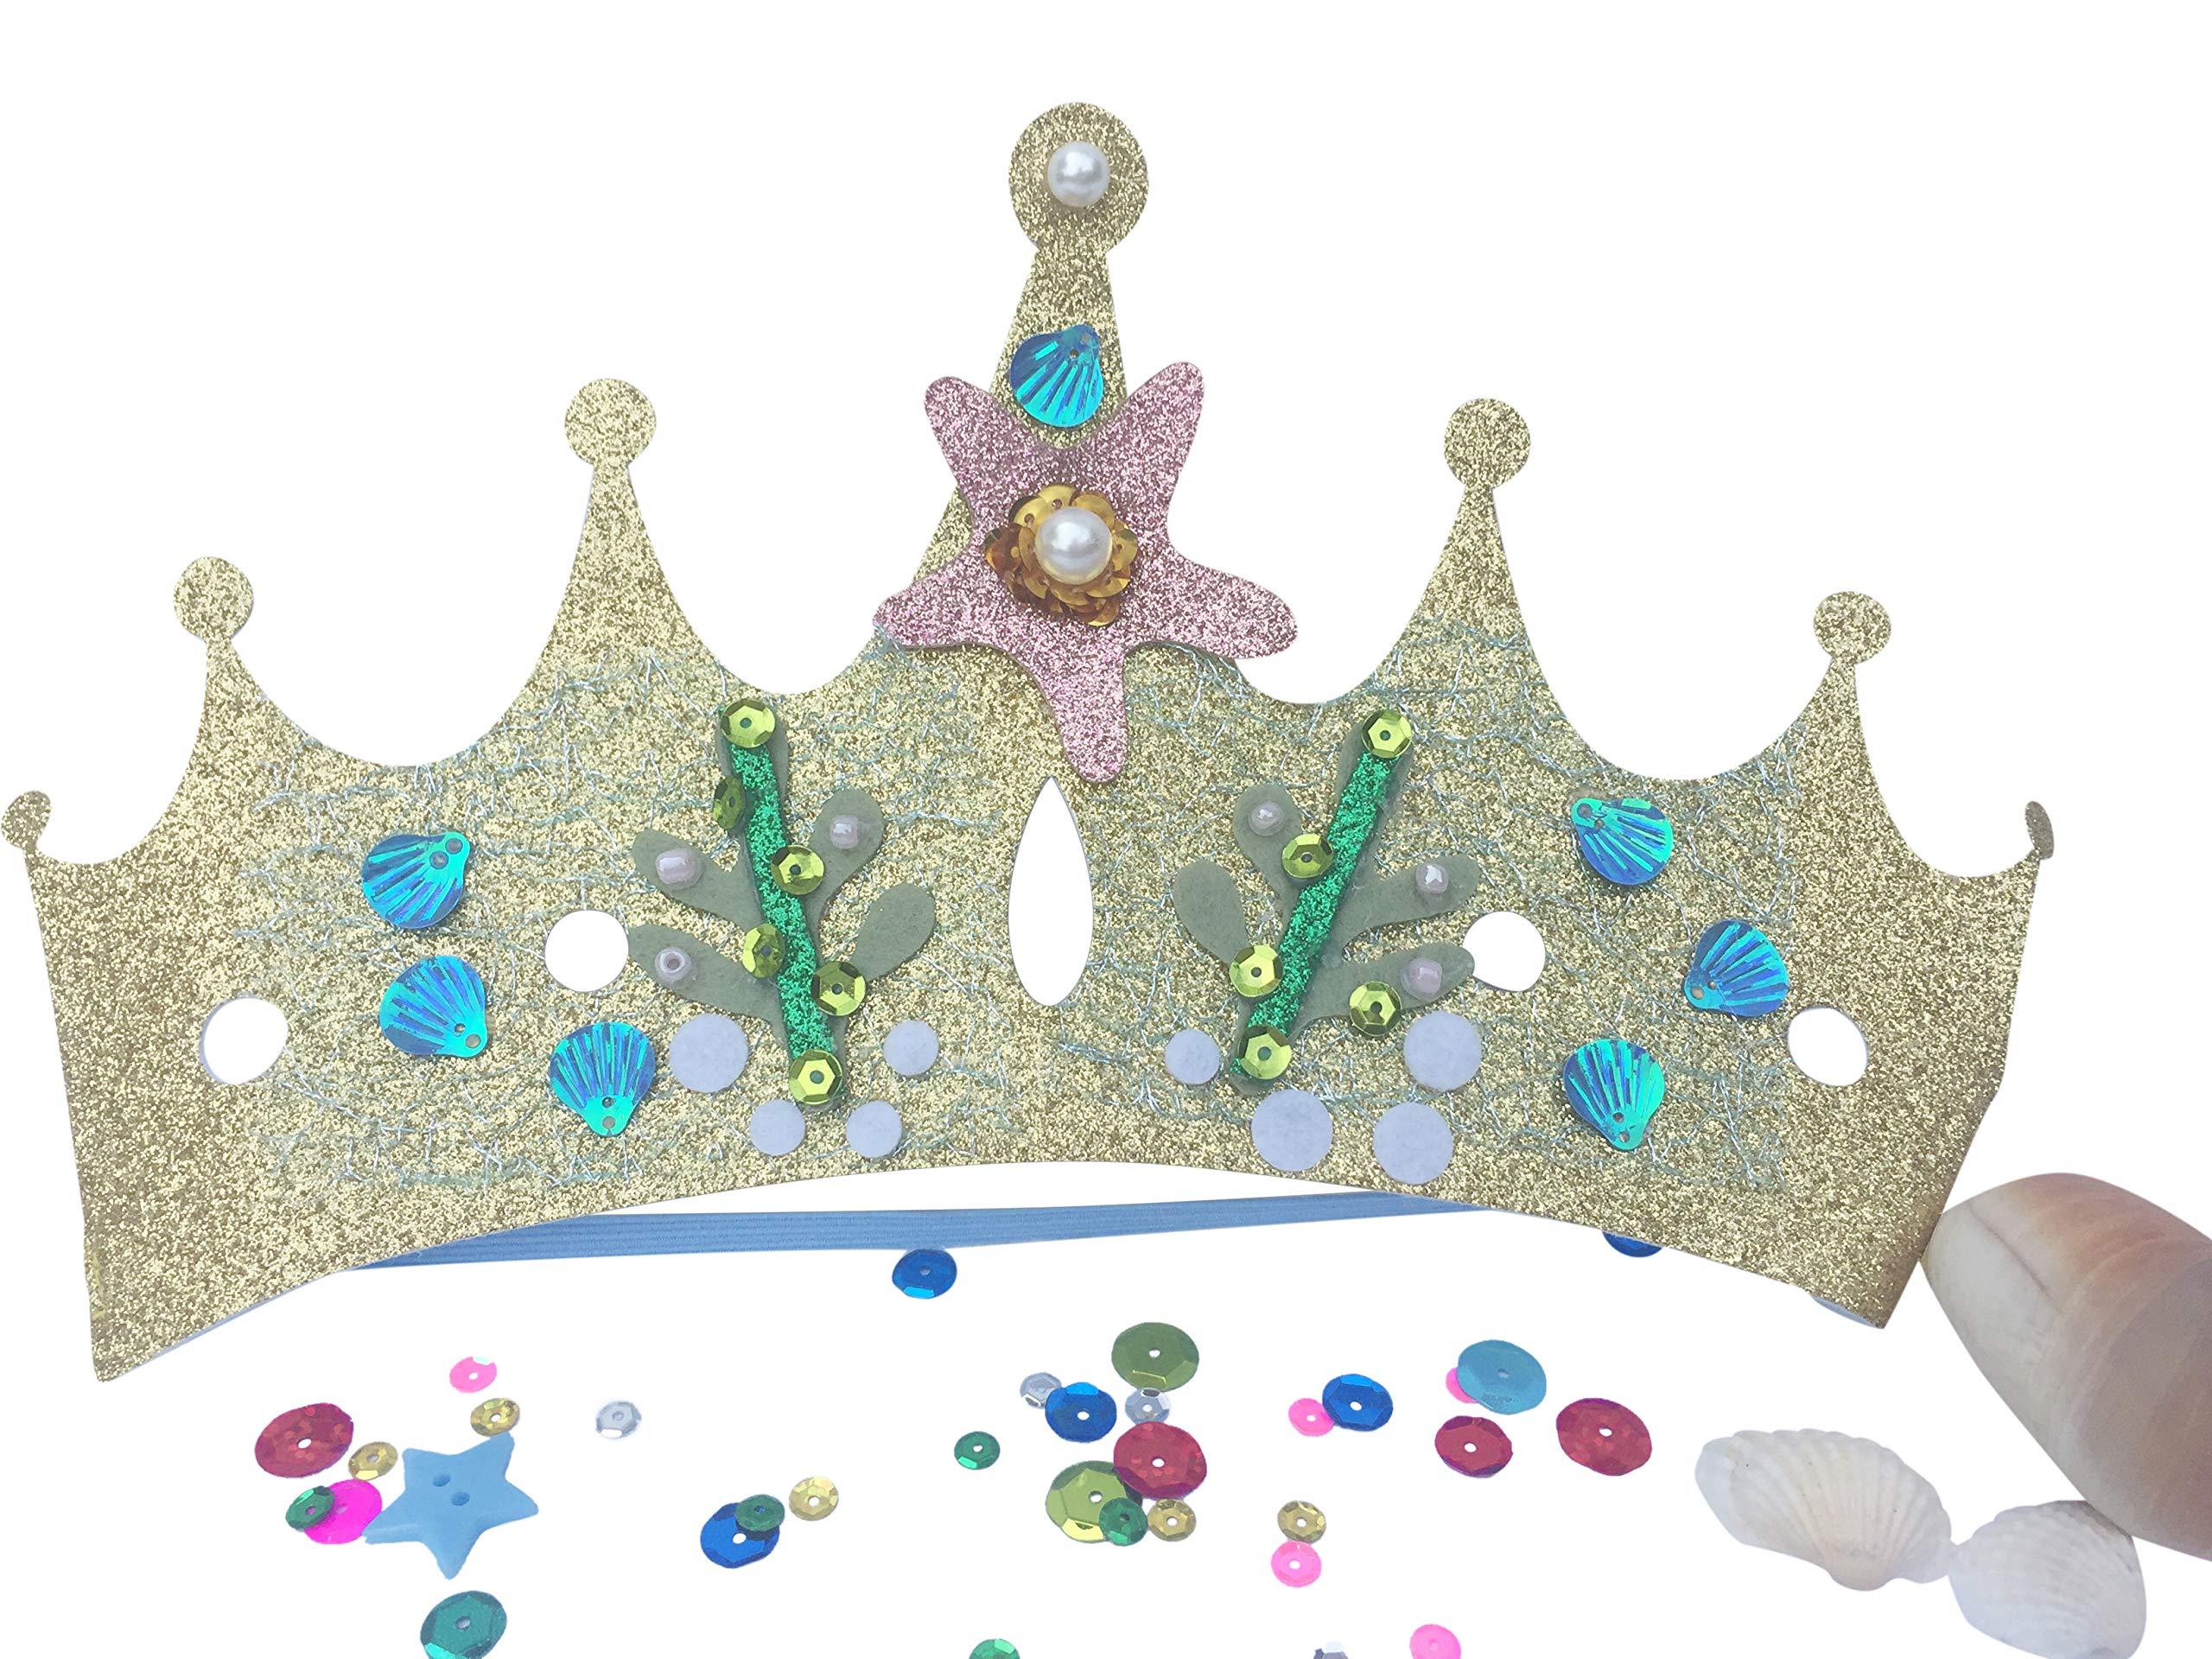 Mermaid Crown Tiara for Girls: Mermaid Hair Accessories for Kids and Toddlers